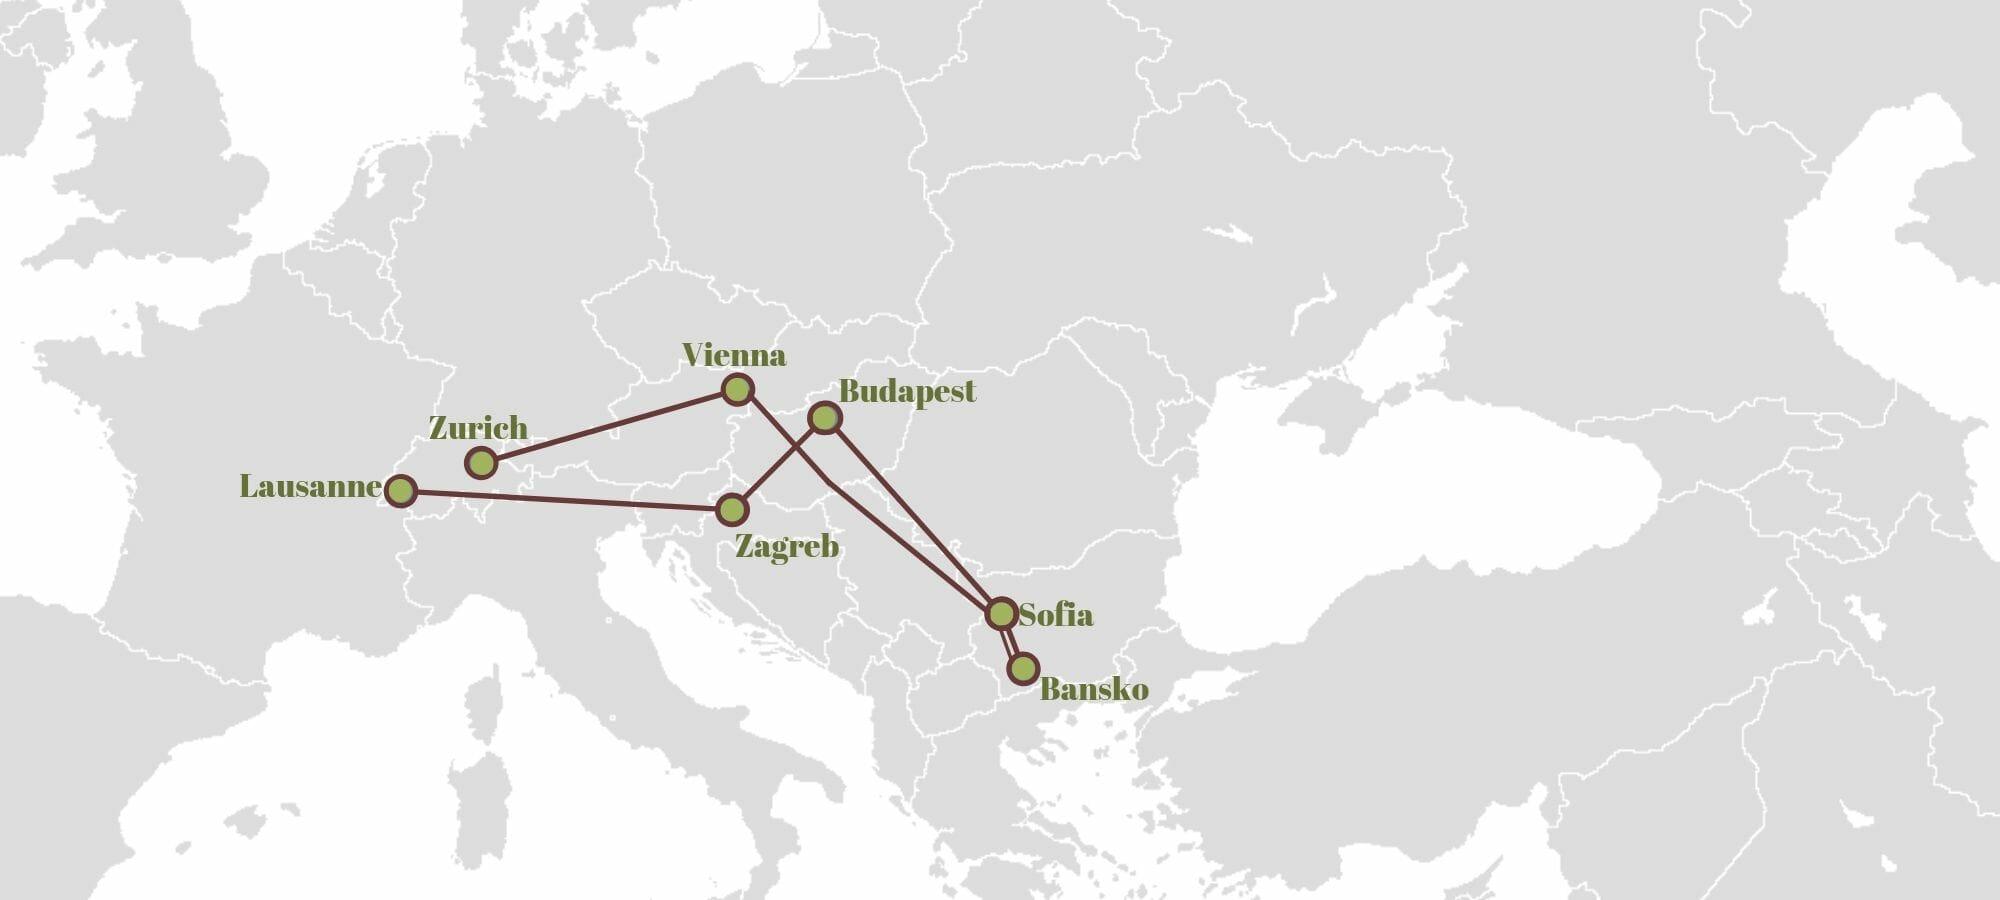 road trip en europe flixbus